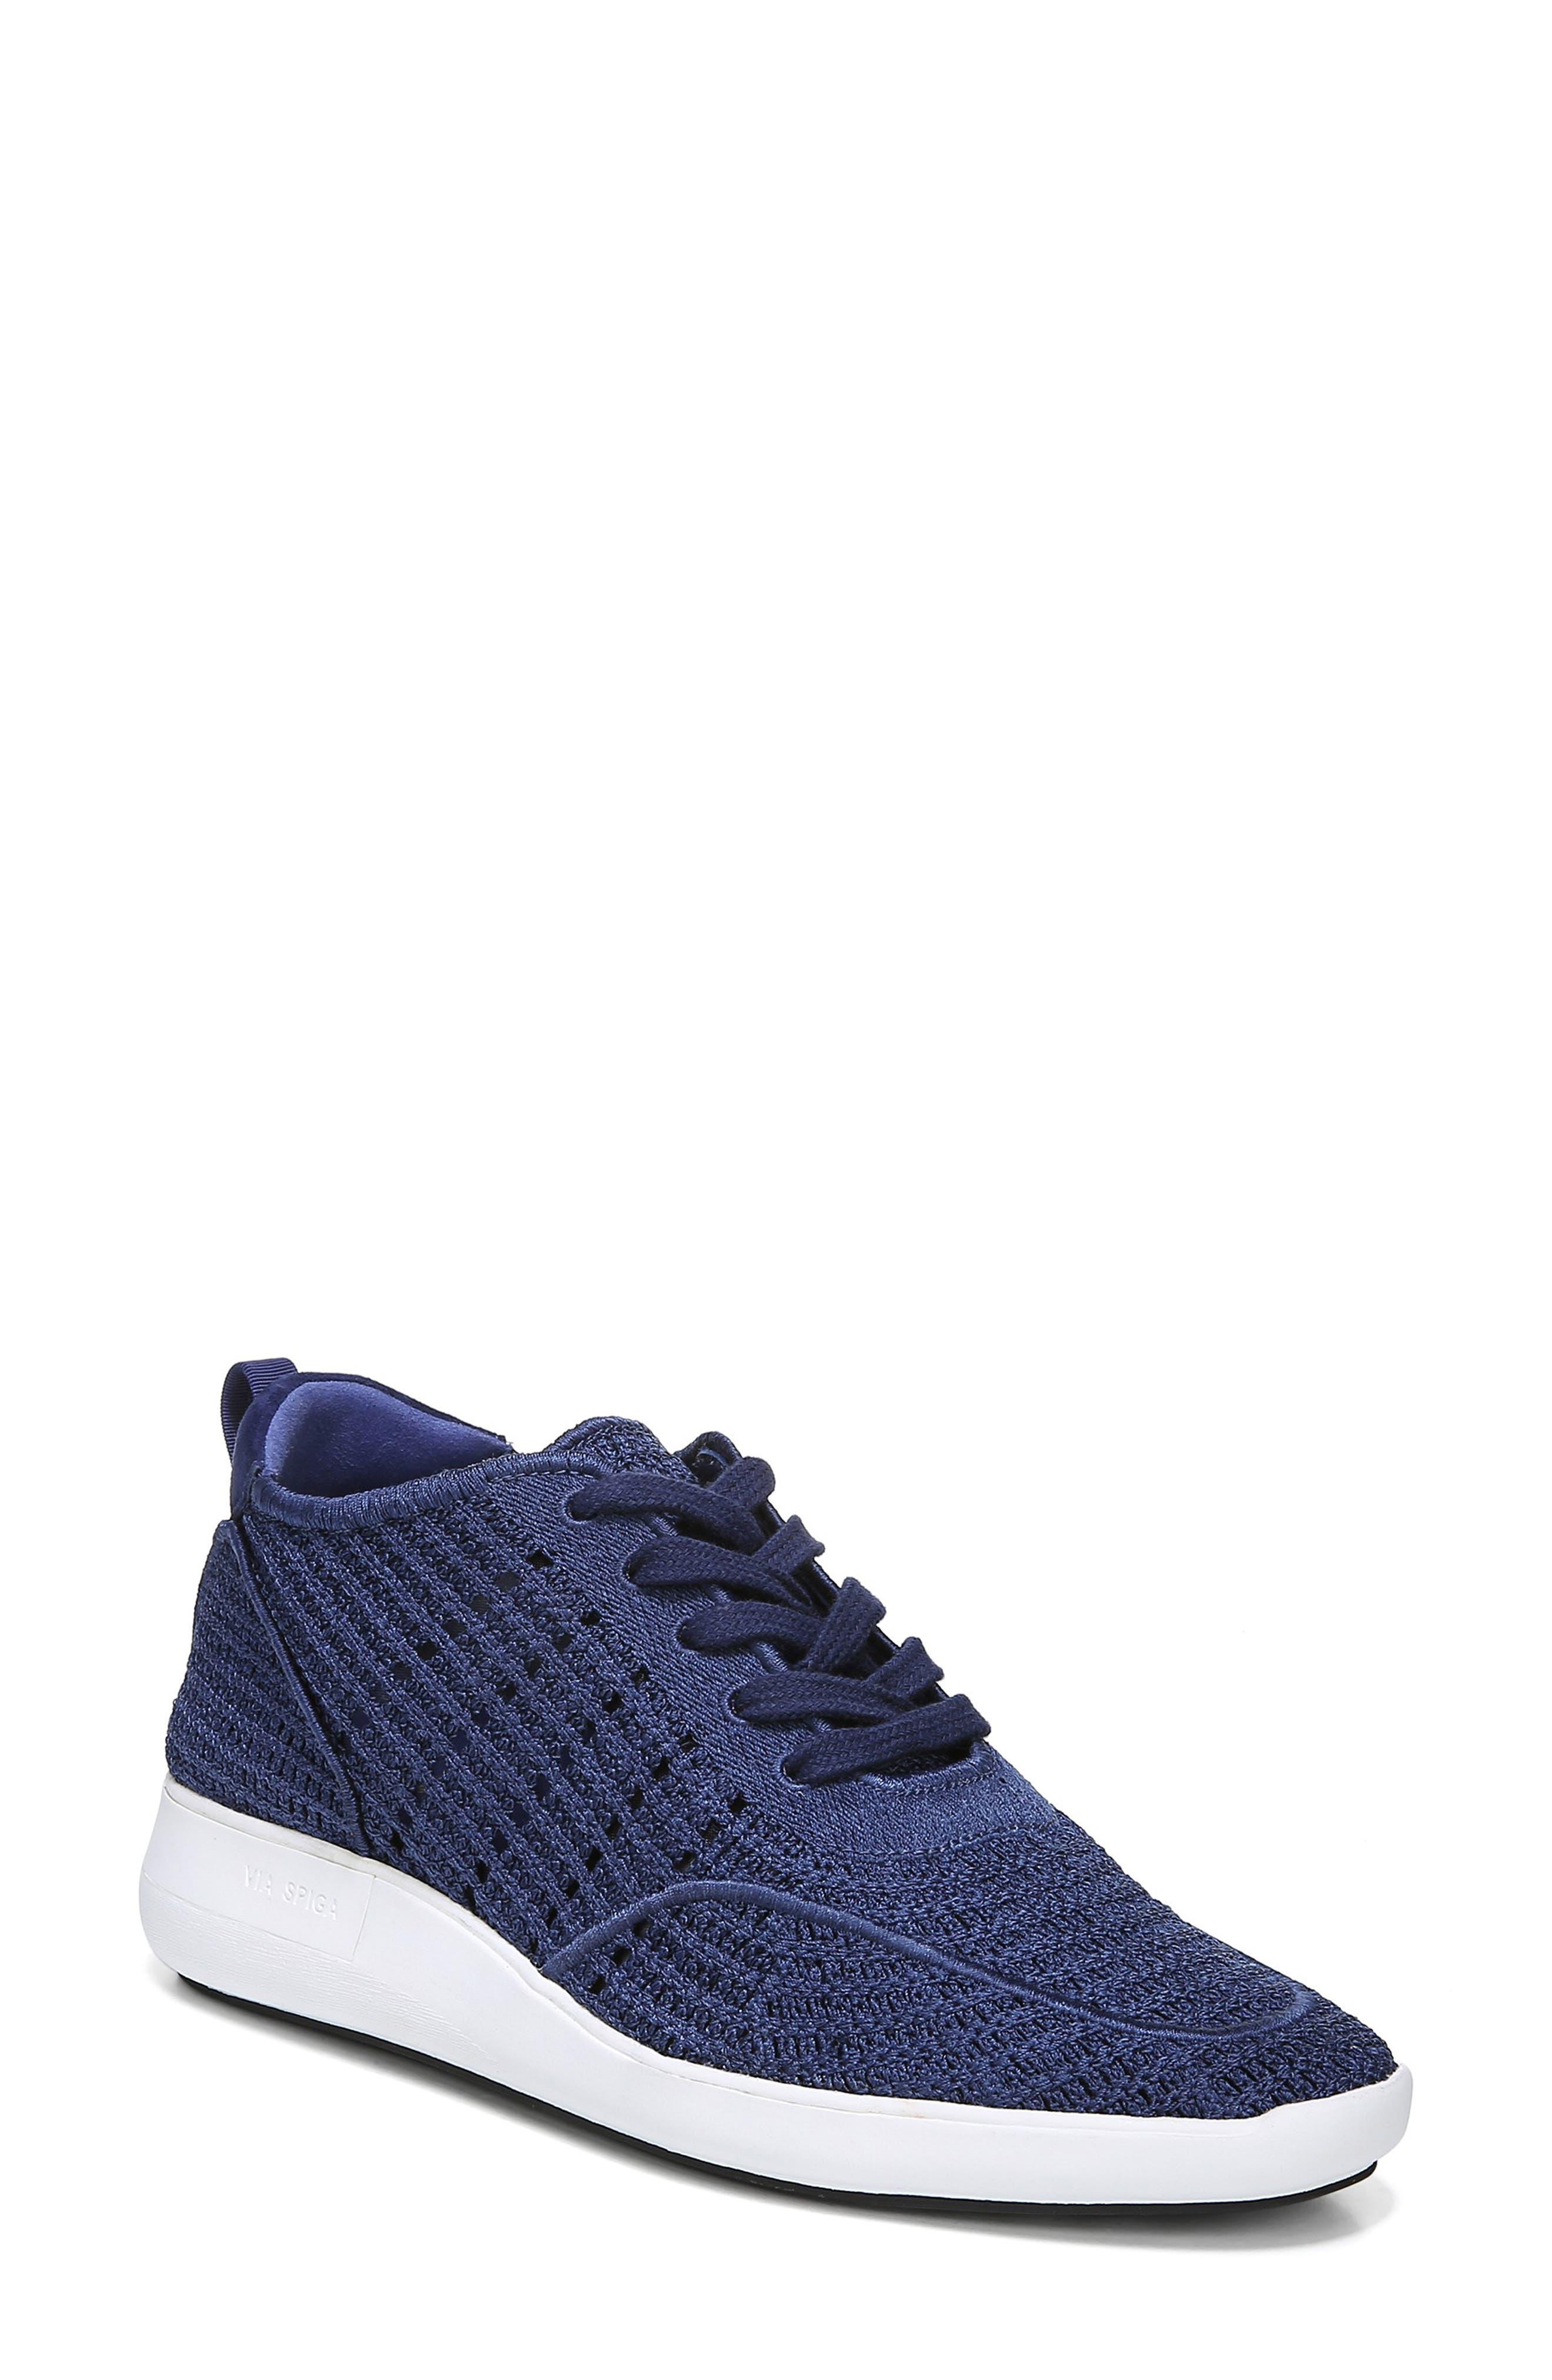 Via Spiga Macra Woven Sneaker, Blue